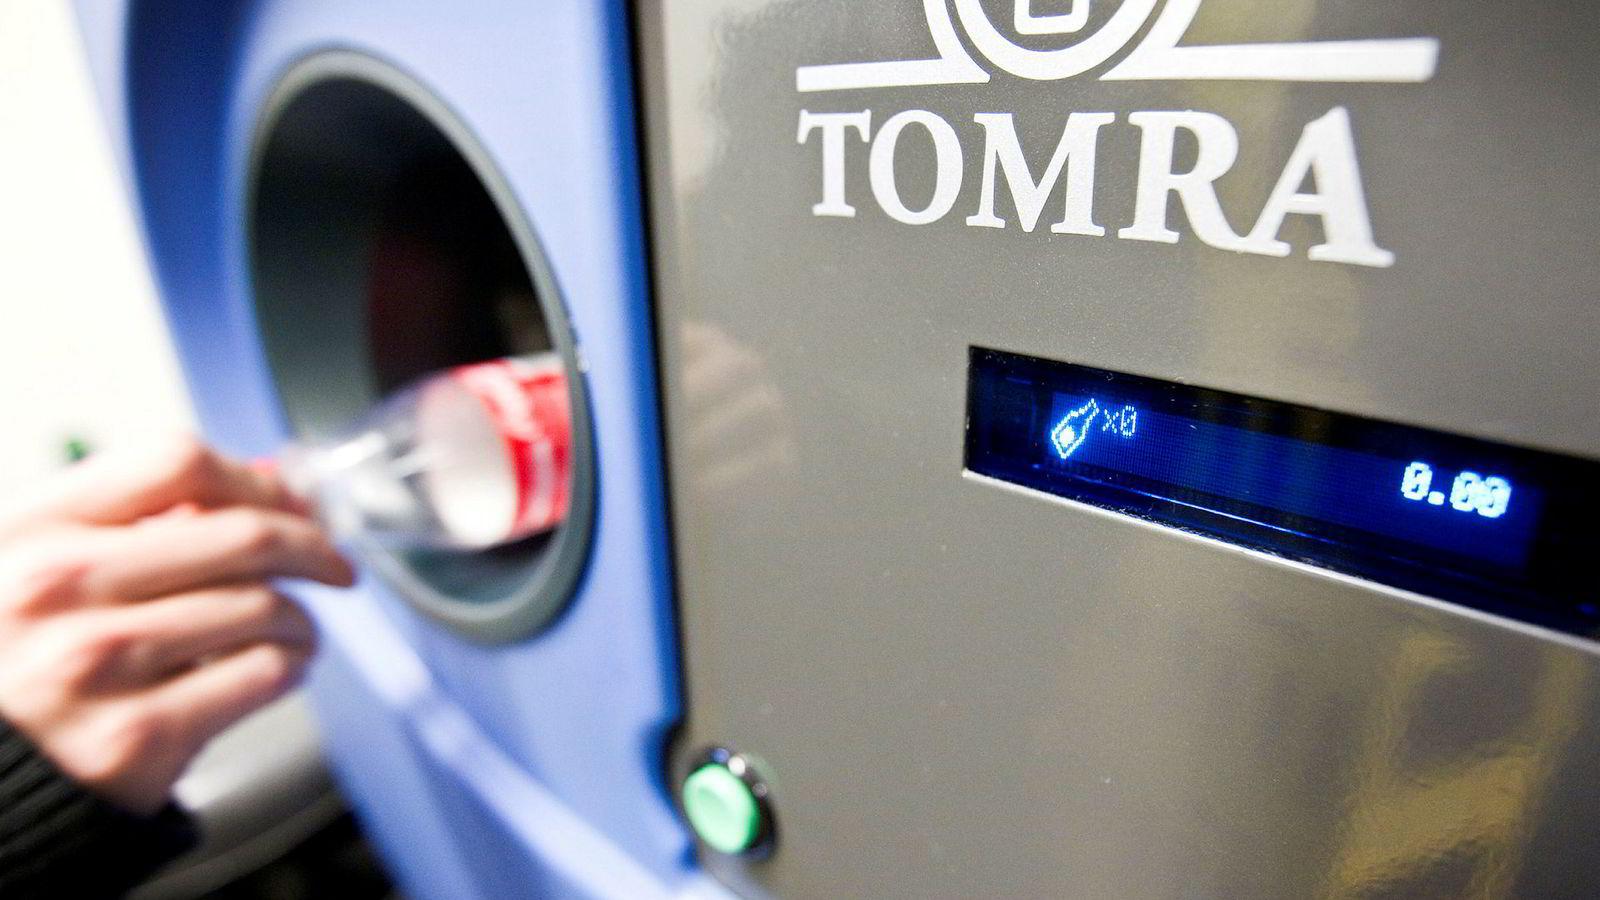 Tomra er en pionér på panteautomater, og er i dag en av verdens ledende aktører på sensorsystemer for optimal ressursutnyttelse.